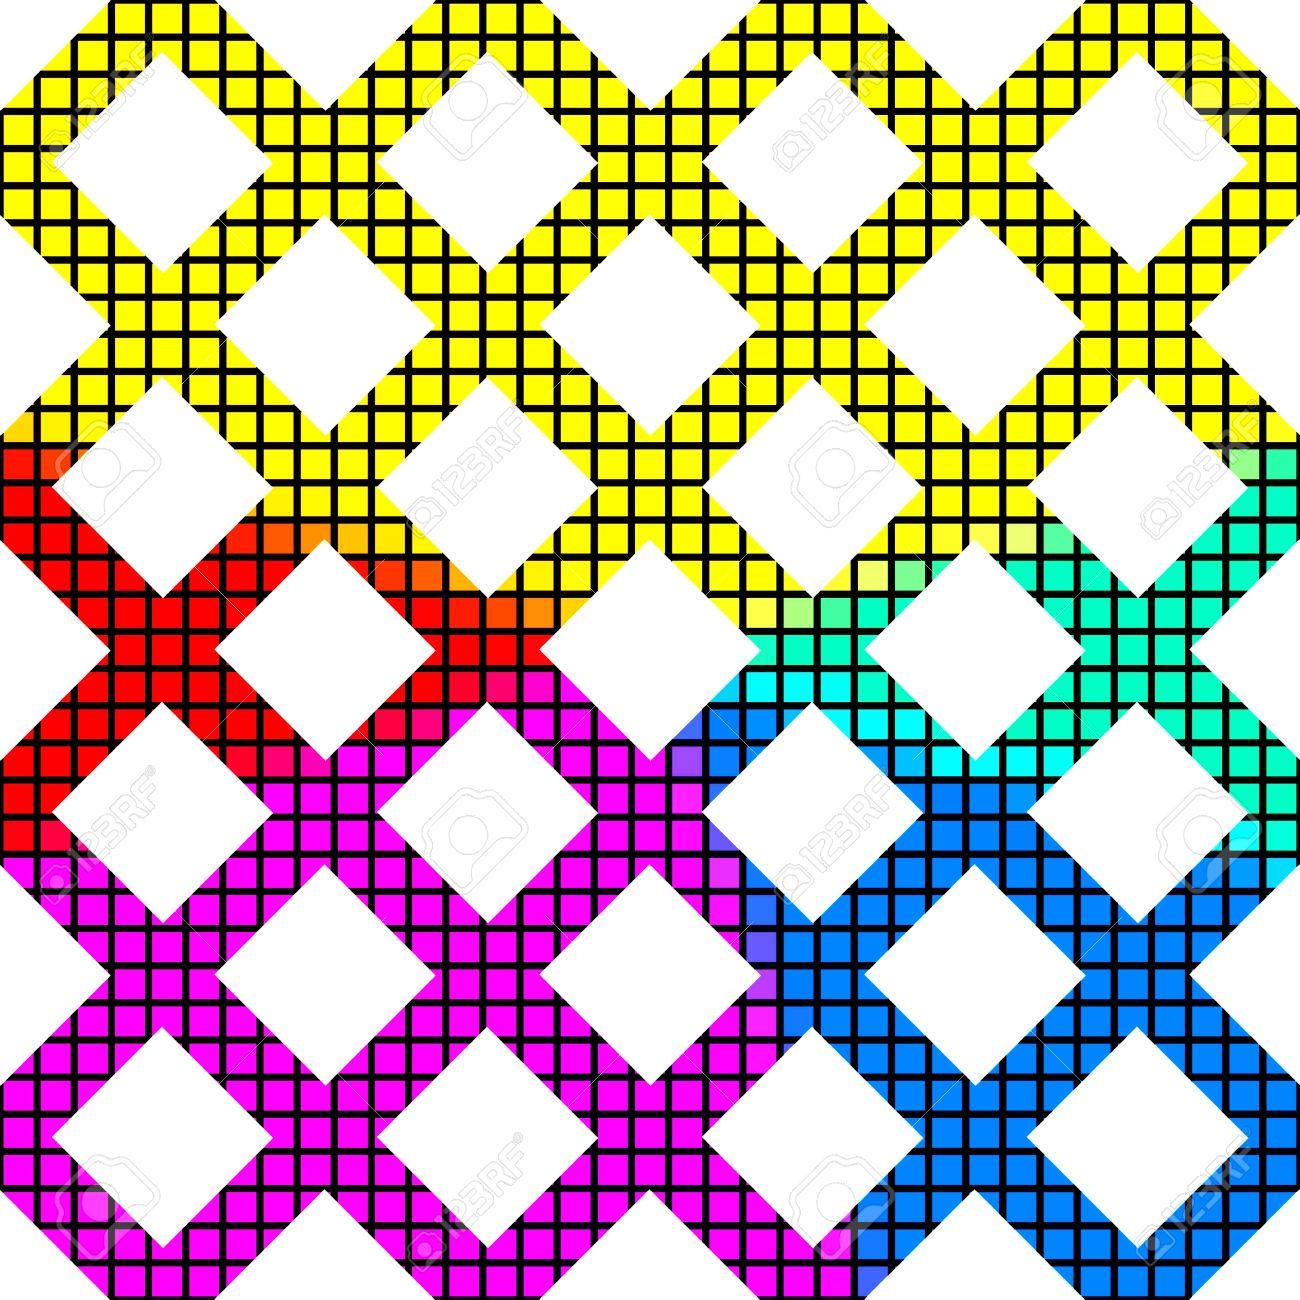 Resumen Cuadrícula Recortada De Un Arco Iris Pixelada Textura ...